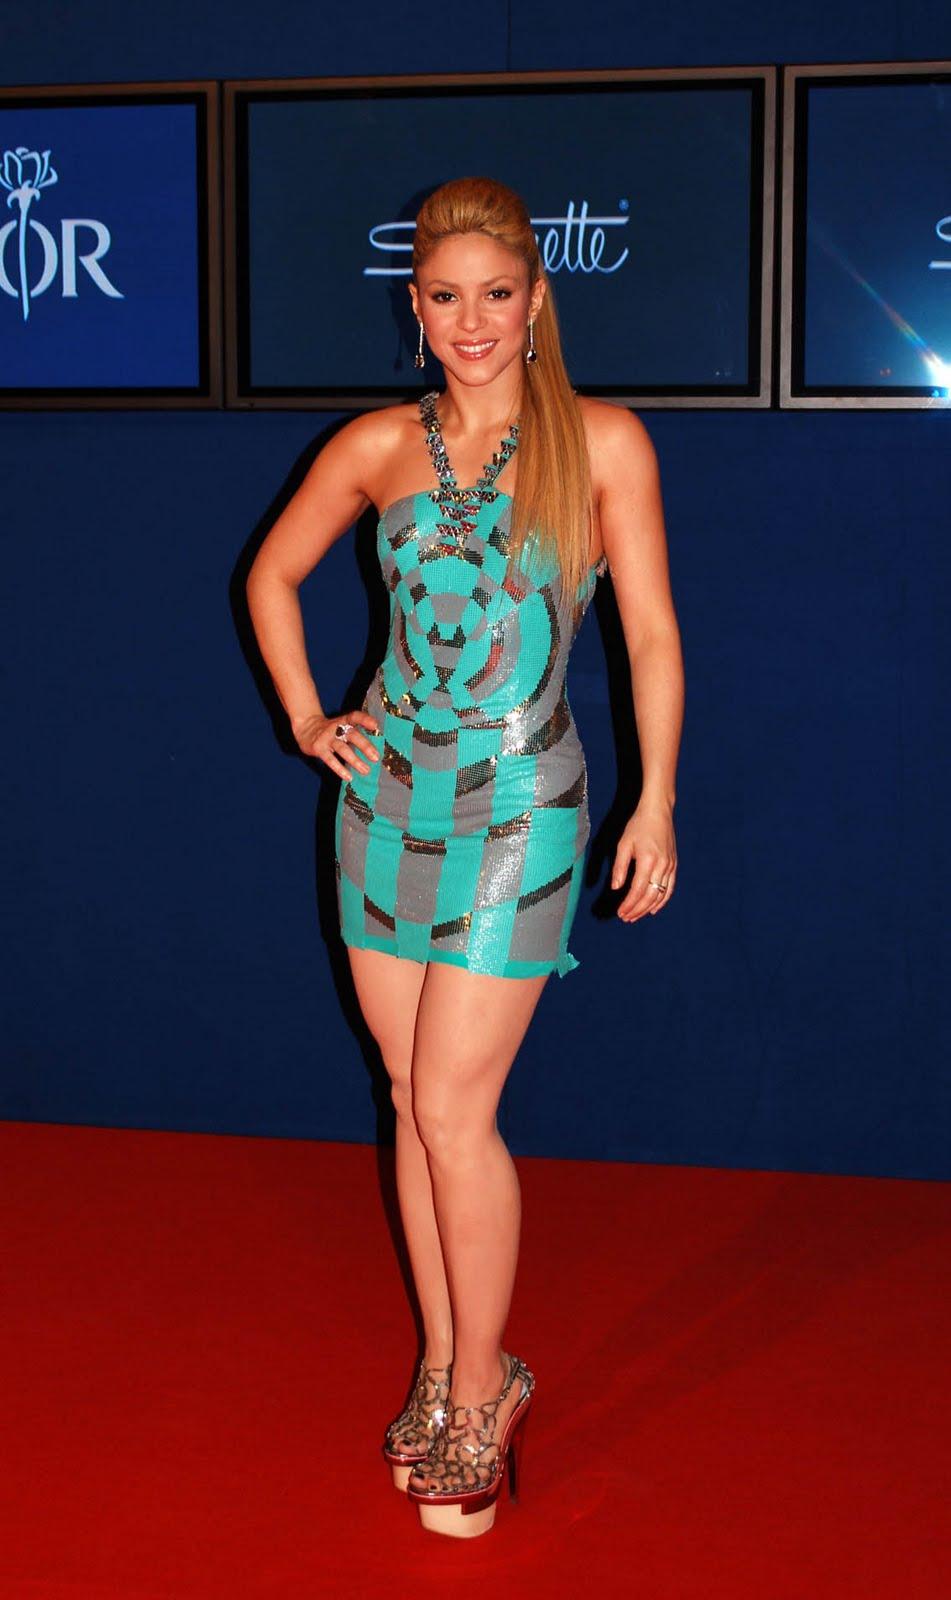 hot babes colombian hottie shakira in a sexy little dress